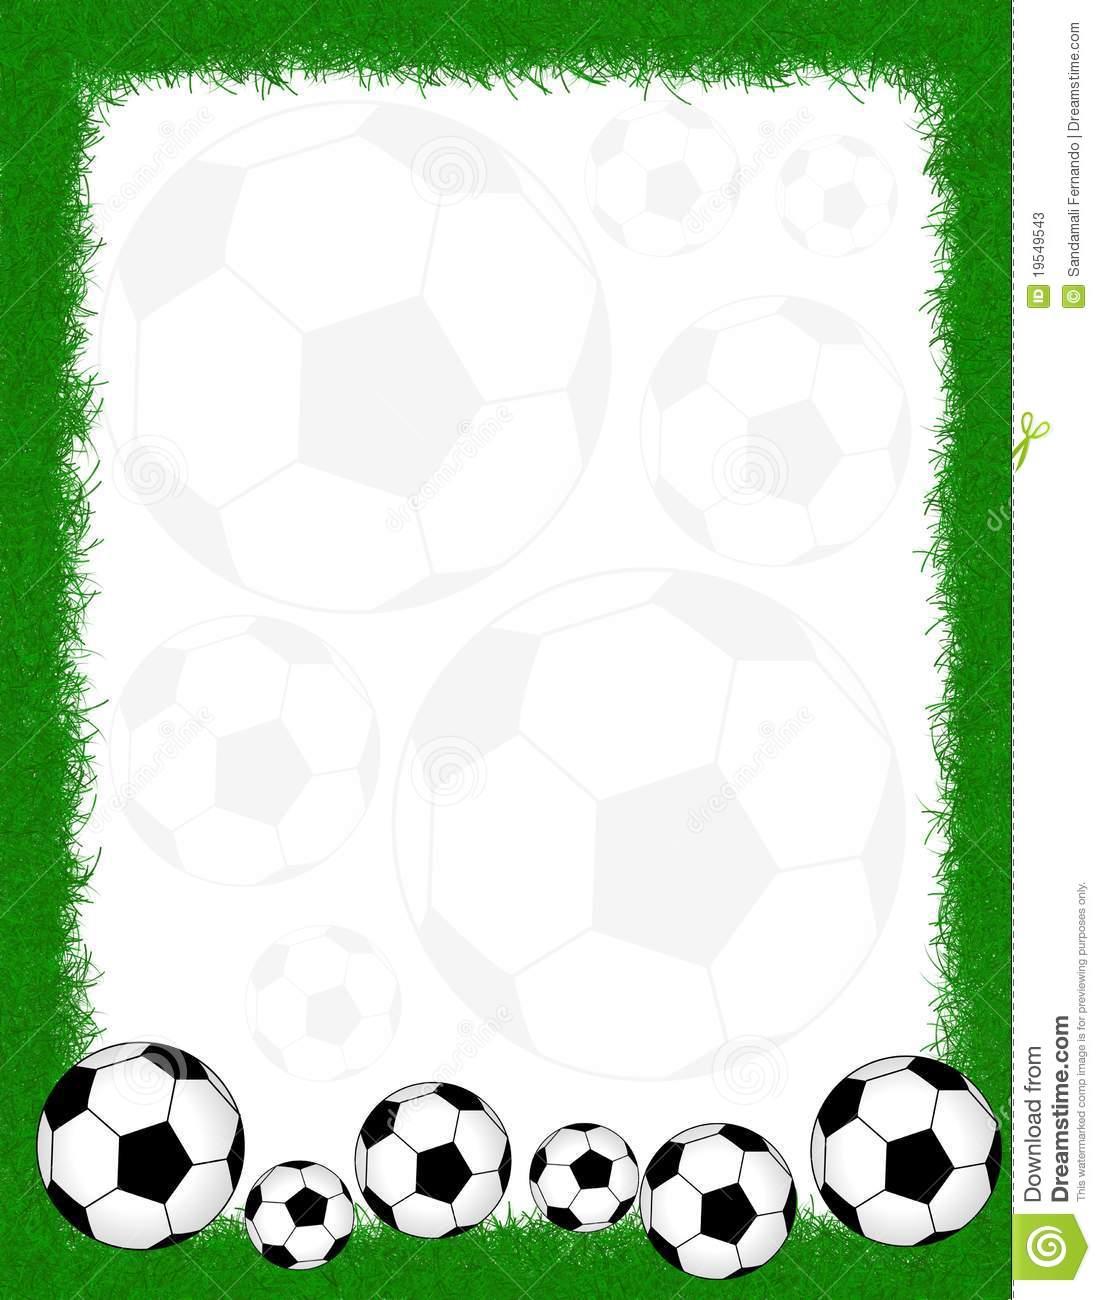 1101x1300 Football Border Clipart